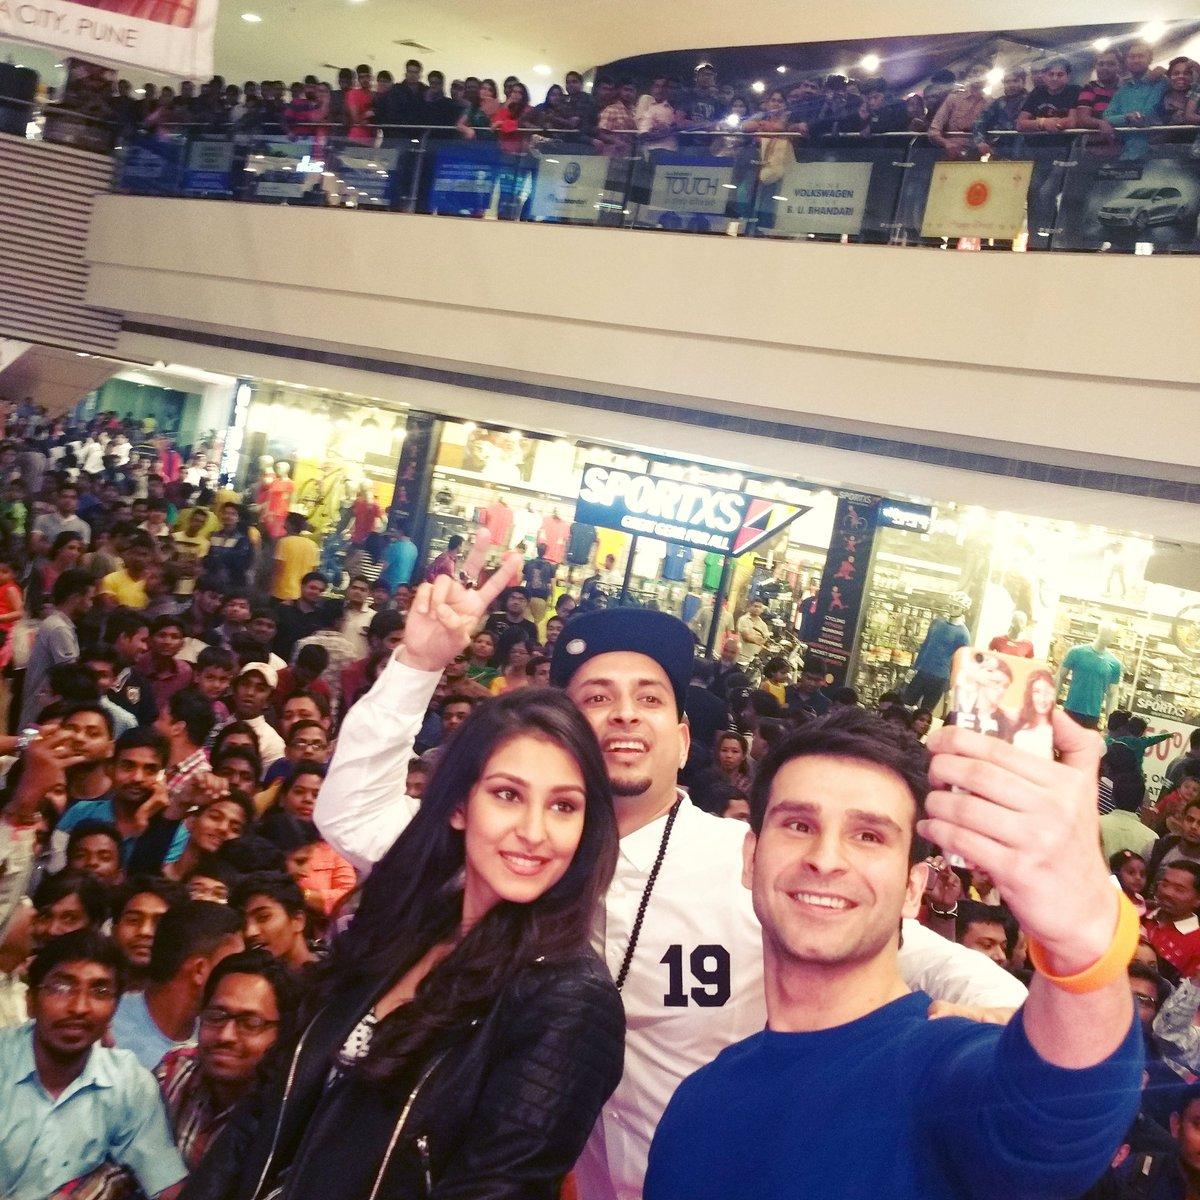 #Loveshhuda Promotions w @GirishKumarT & @nkdhillon13  continues. Dope energy! Thank you for the LOVE Pune! #Feb19 https://t.co/1QgjEFth8b